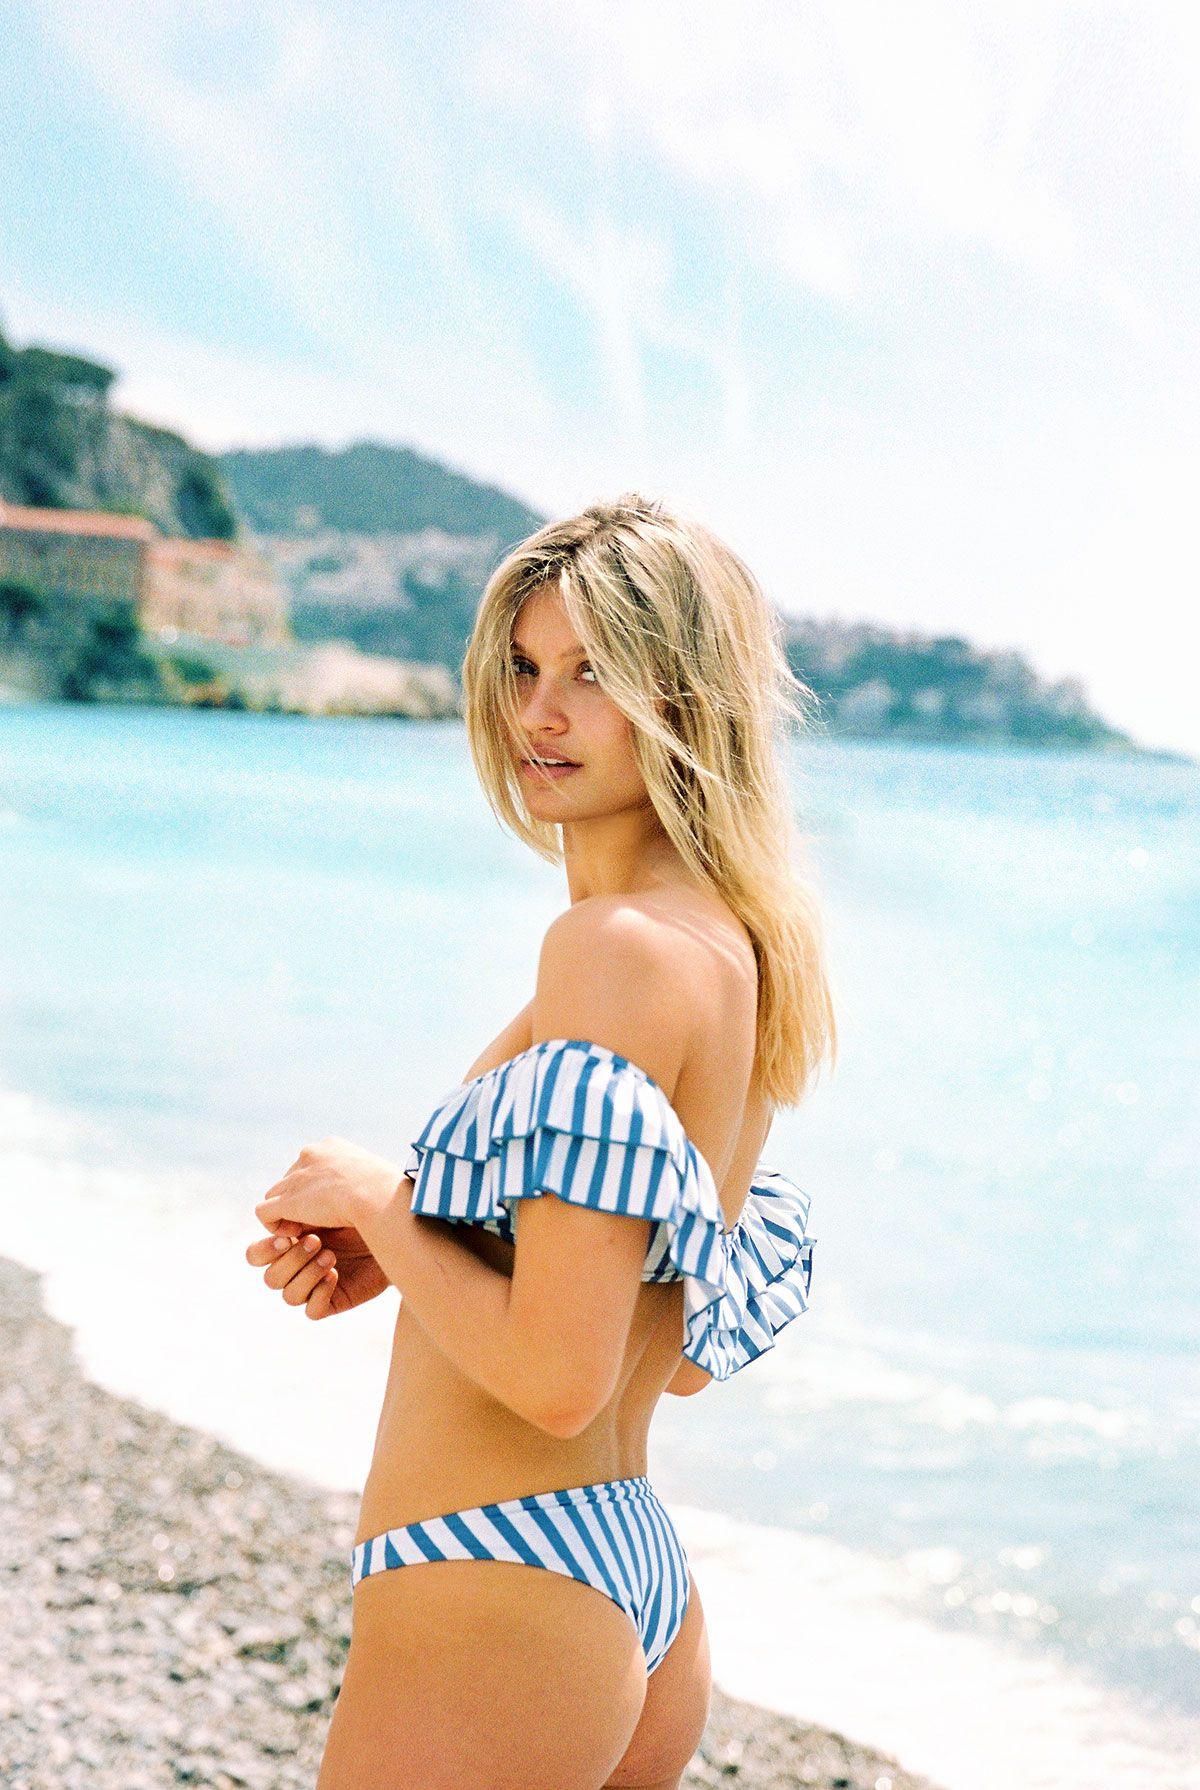 Bikini Caroline Corinth nude (92 photos), Tits, Is a cute, Feet, cleavage 2006